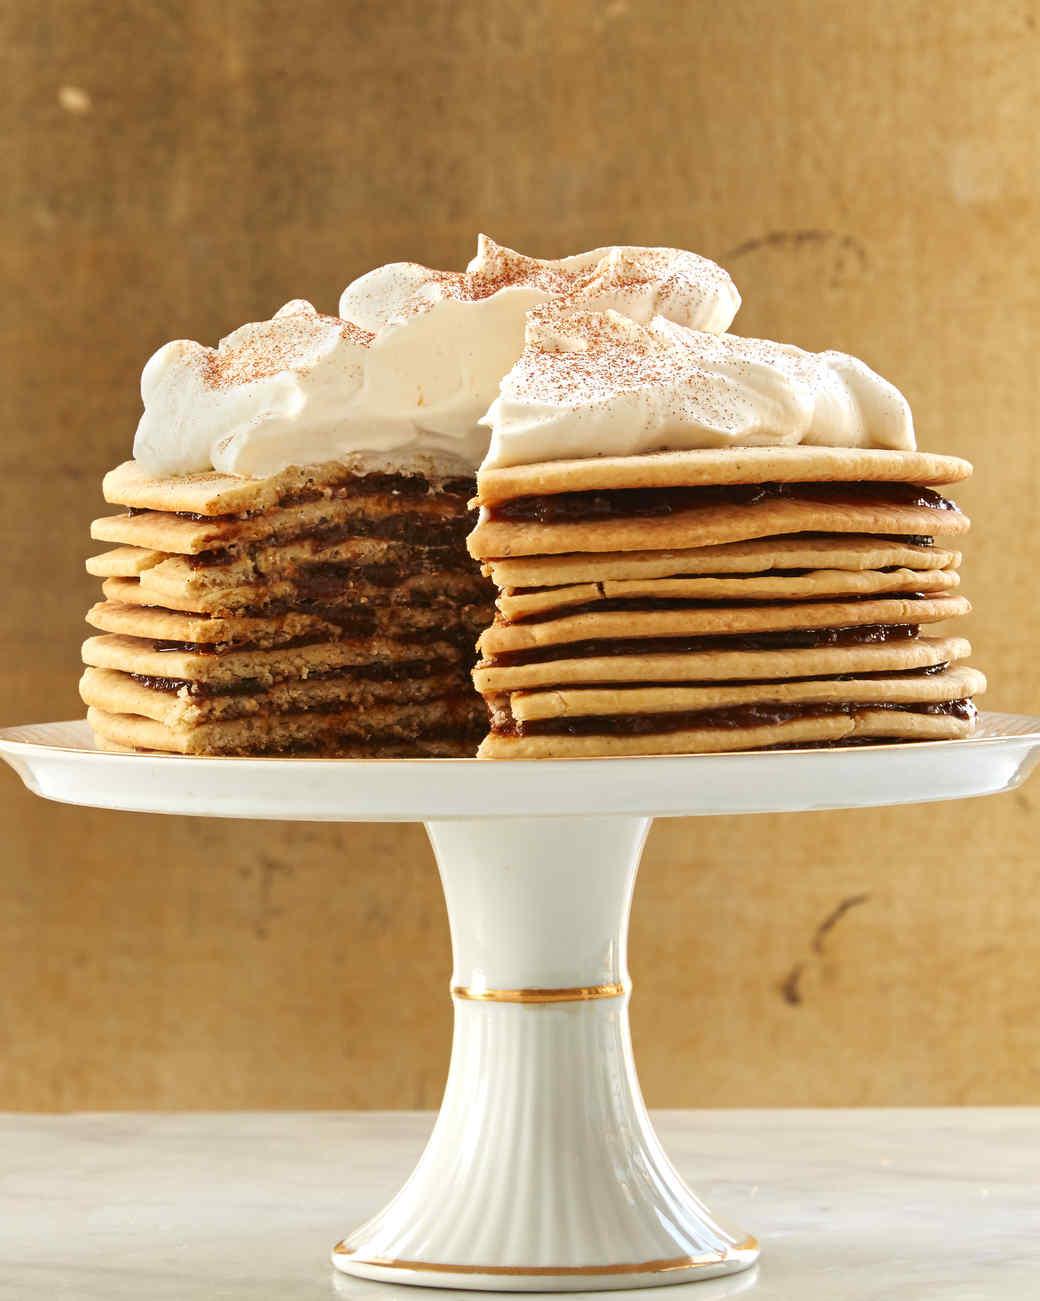 plum-butter-stack-cake-0188-d112647.jpg